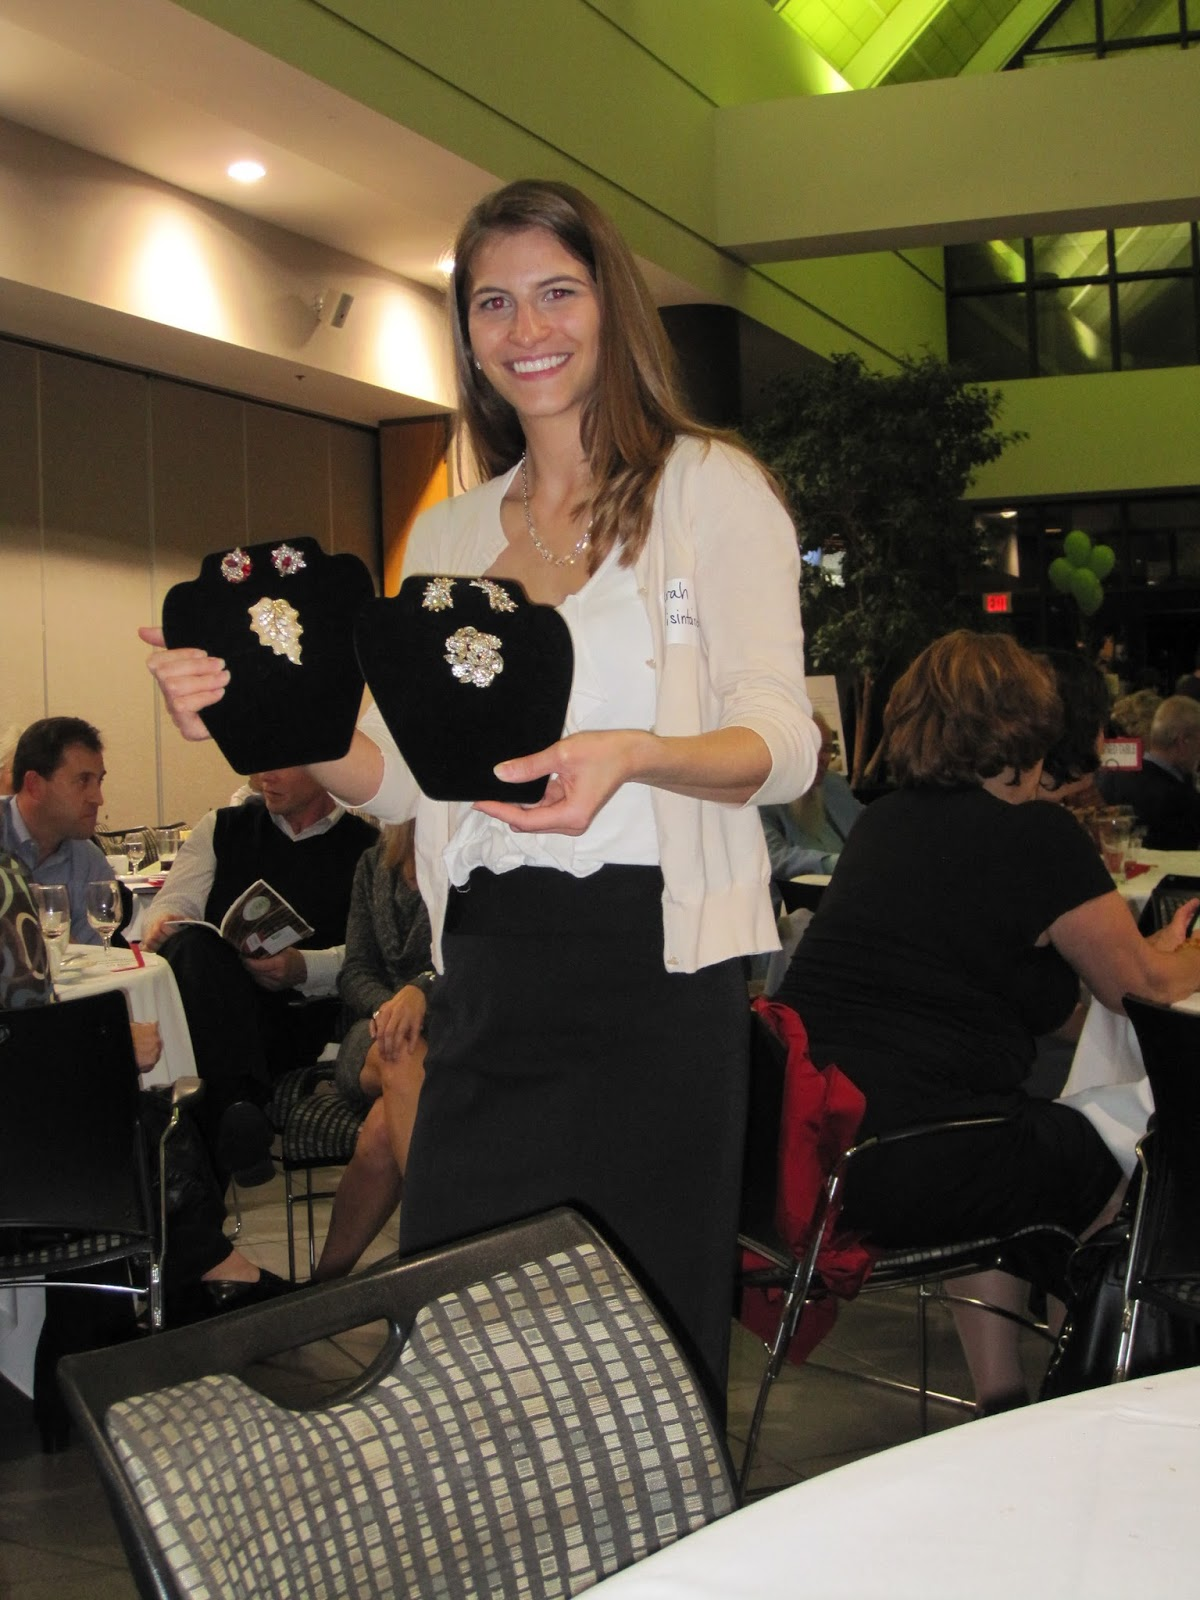 washtenaw literacys world in a basket auction friday